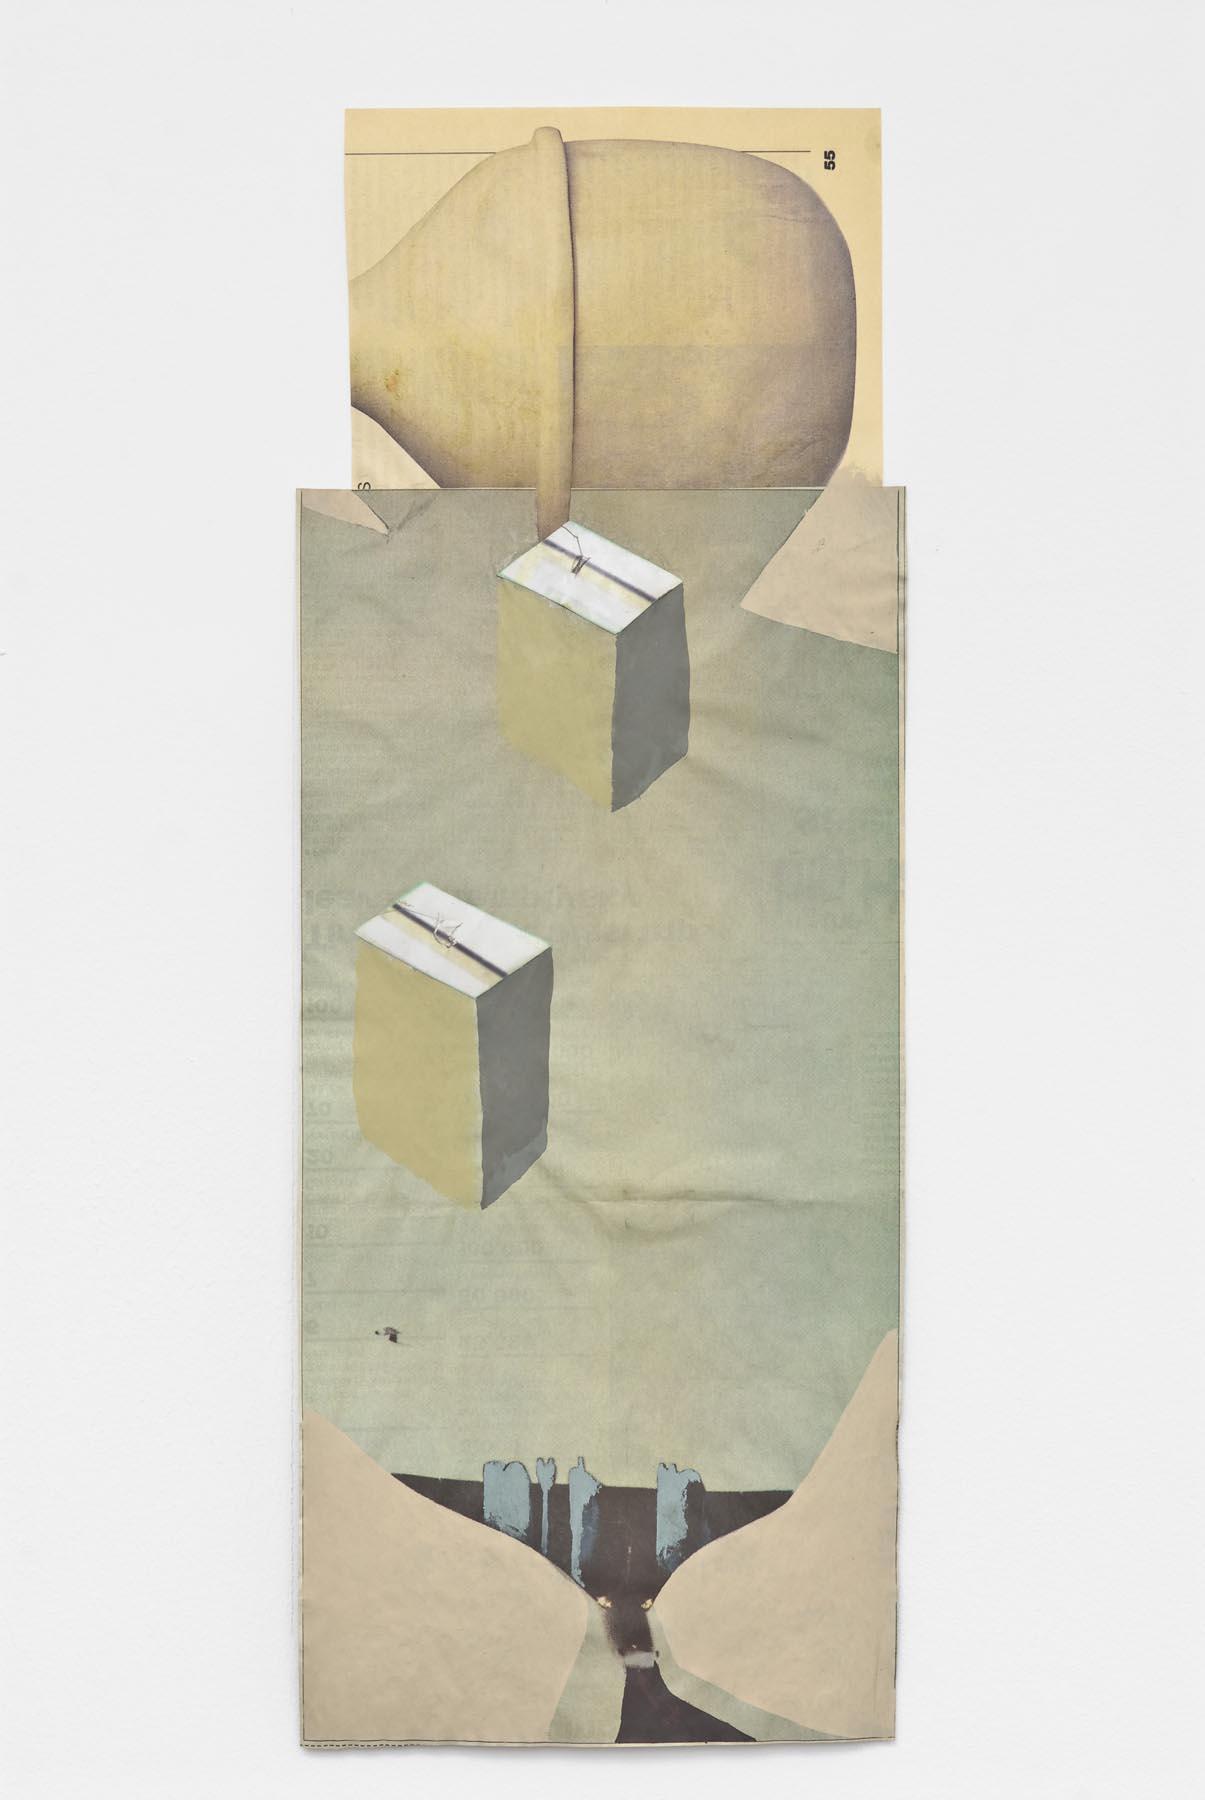 Untitled 2007 acrylic on newsprint 45.8 x 17 cm